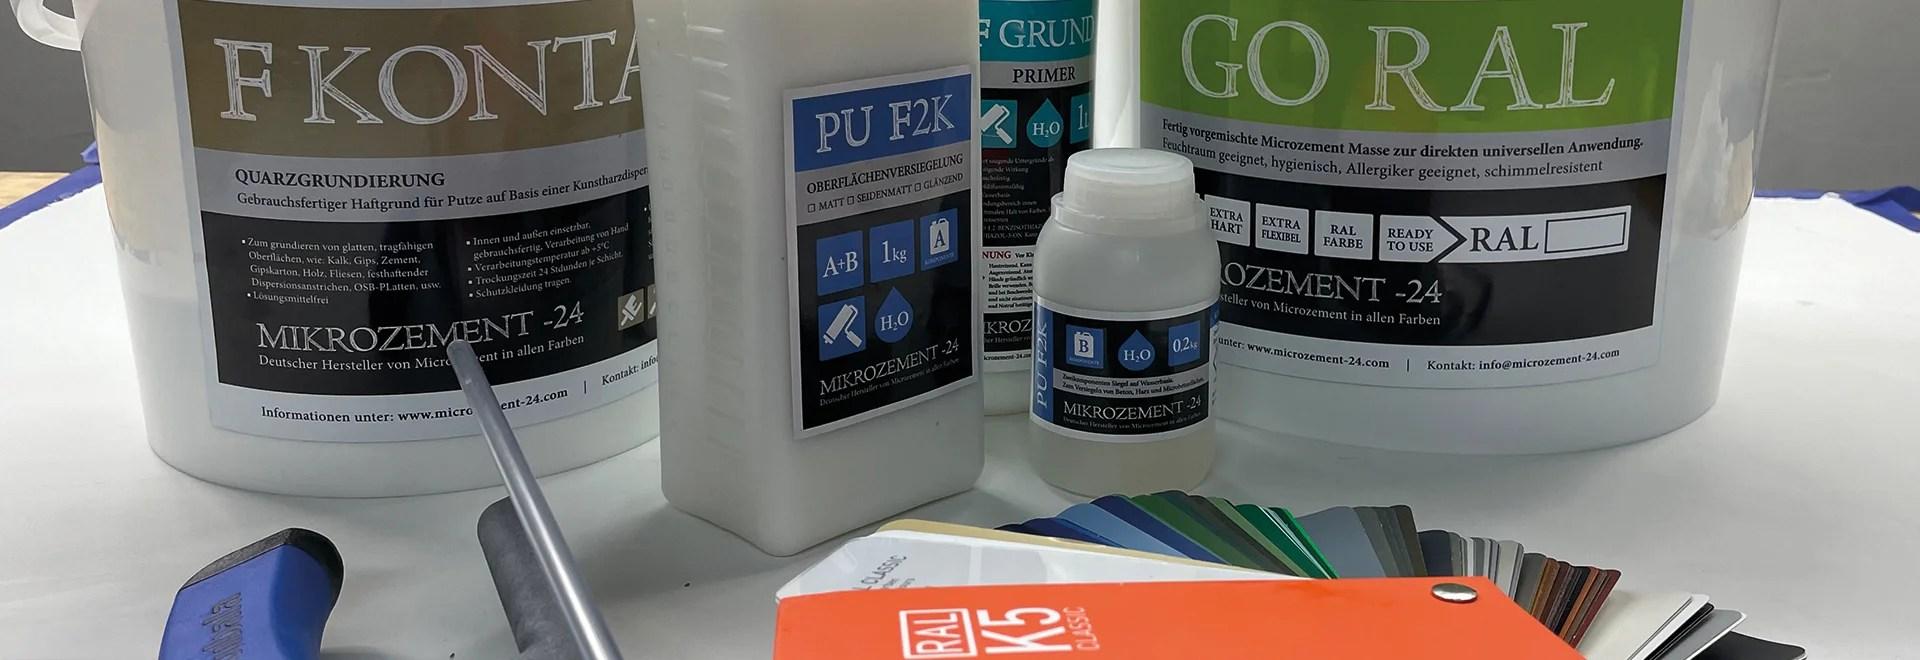 Mikrozement_Microzement GORAL Angebot farbiges BAD DUSCHE BODEN WAND